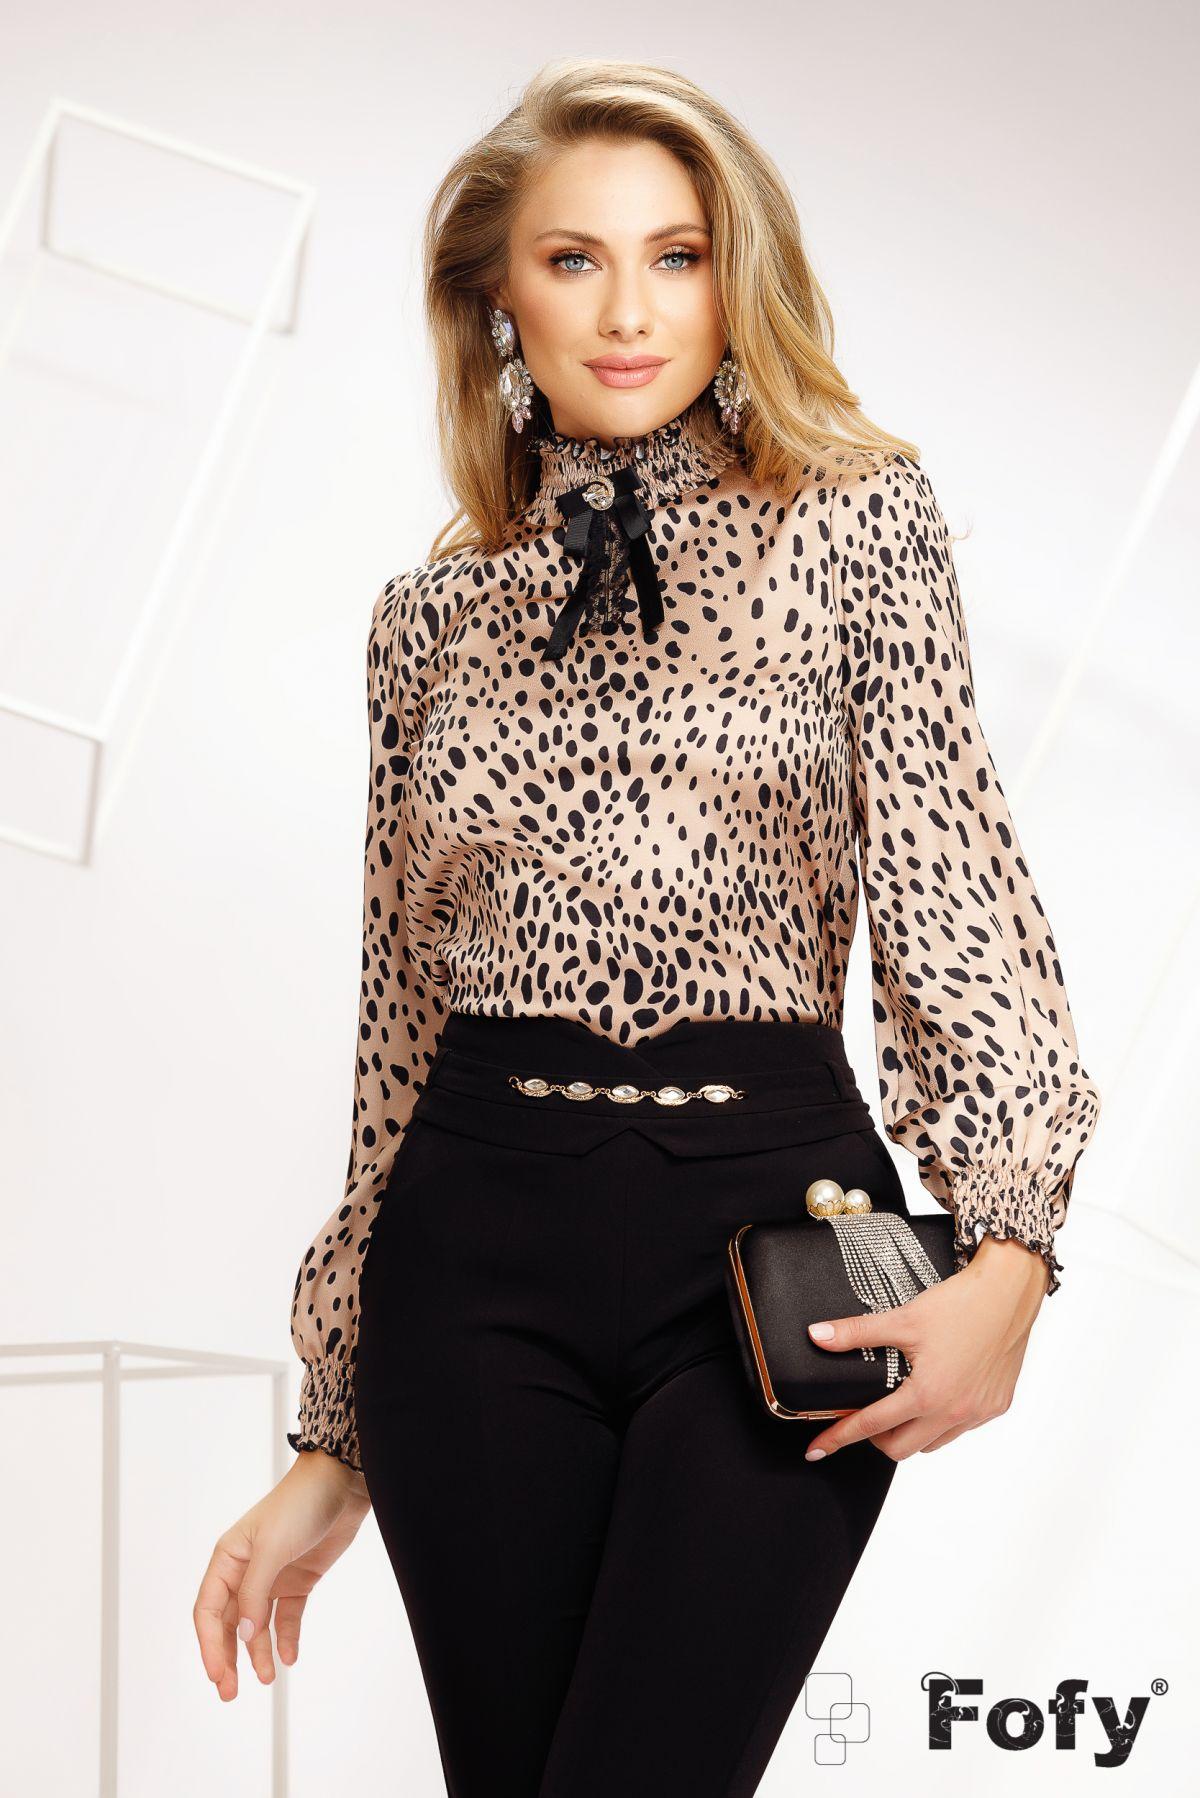 Bluza Fofy eleganta din voal cu animal print si mansete incretite